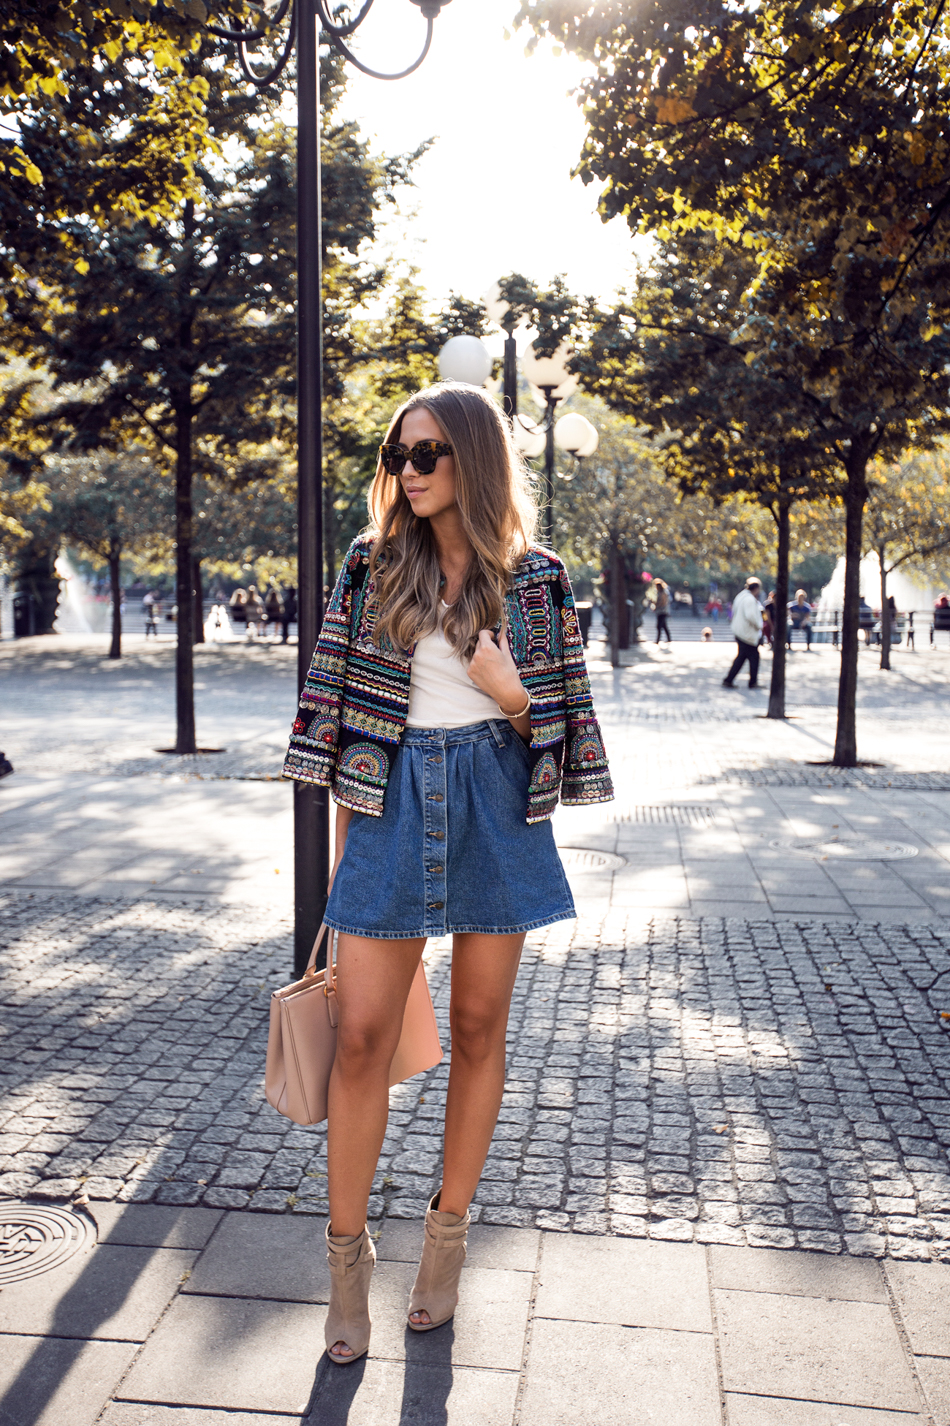 KenzaZouiten_fwday2_outfit_st-4